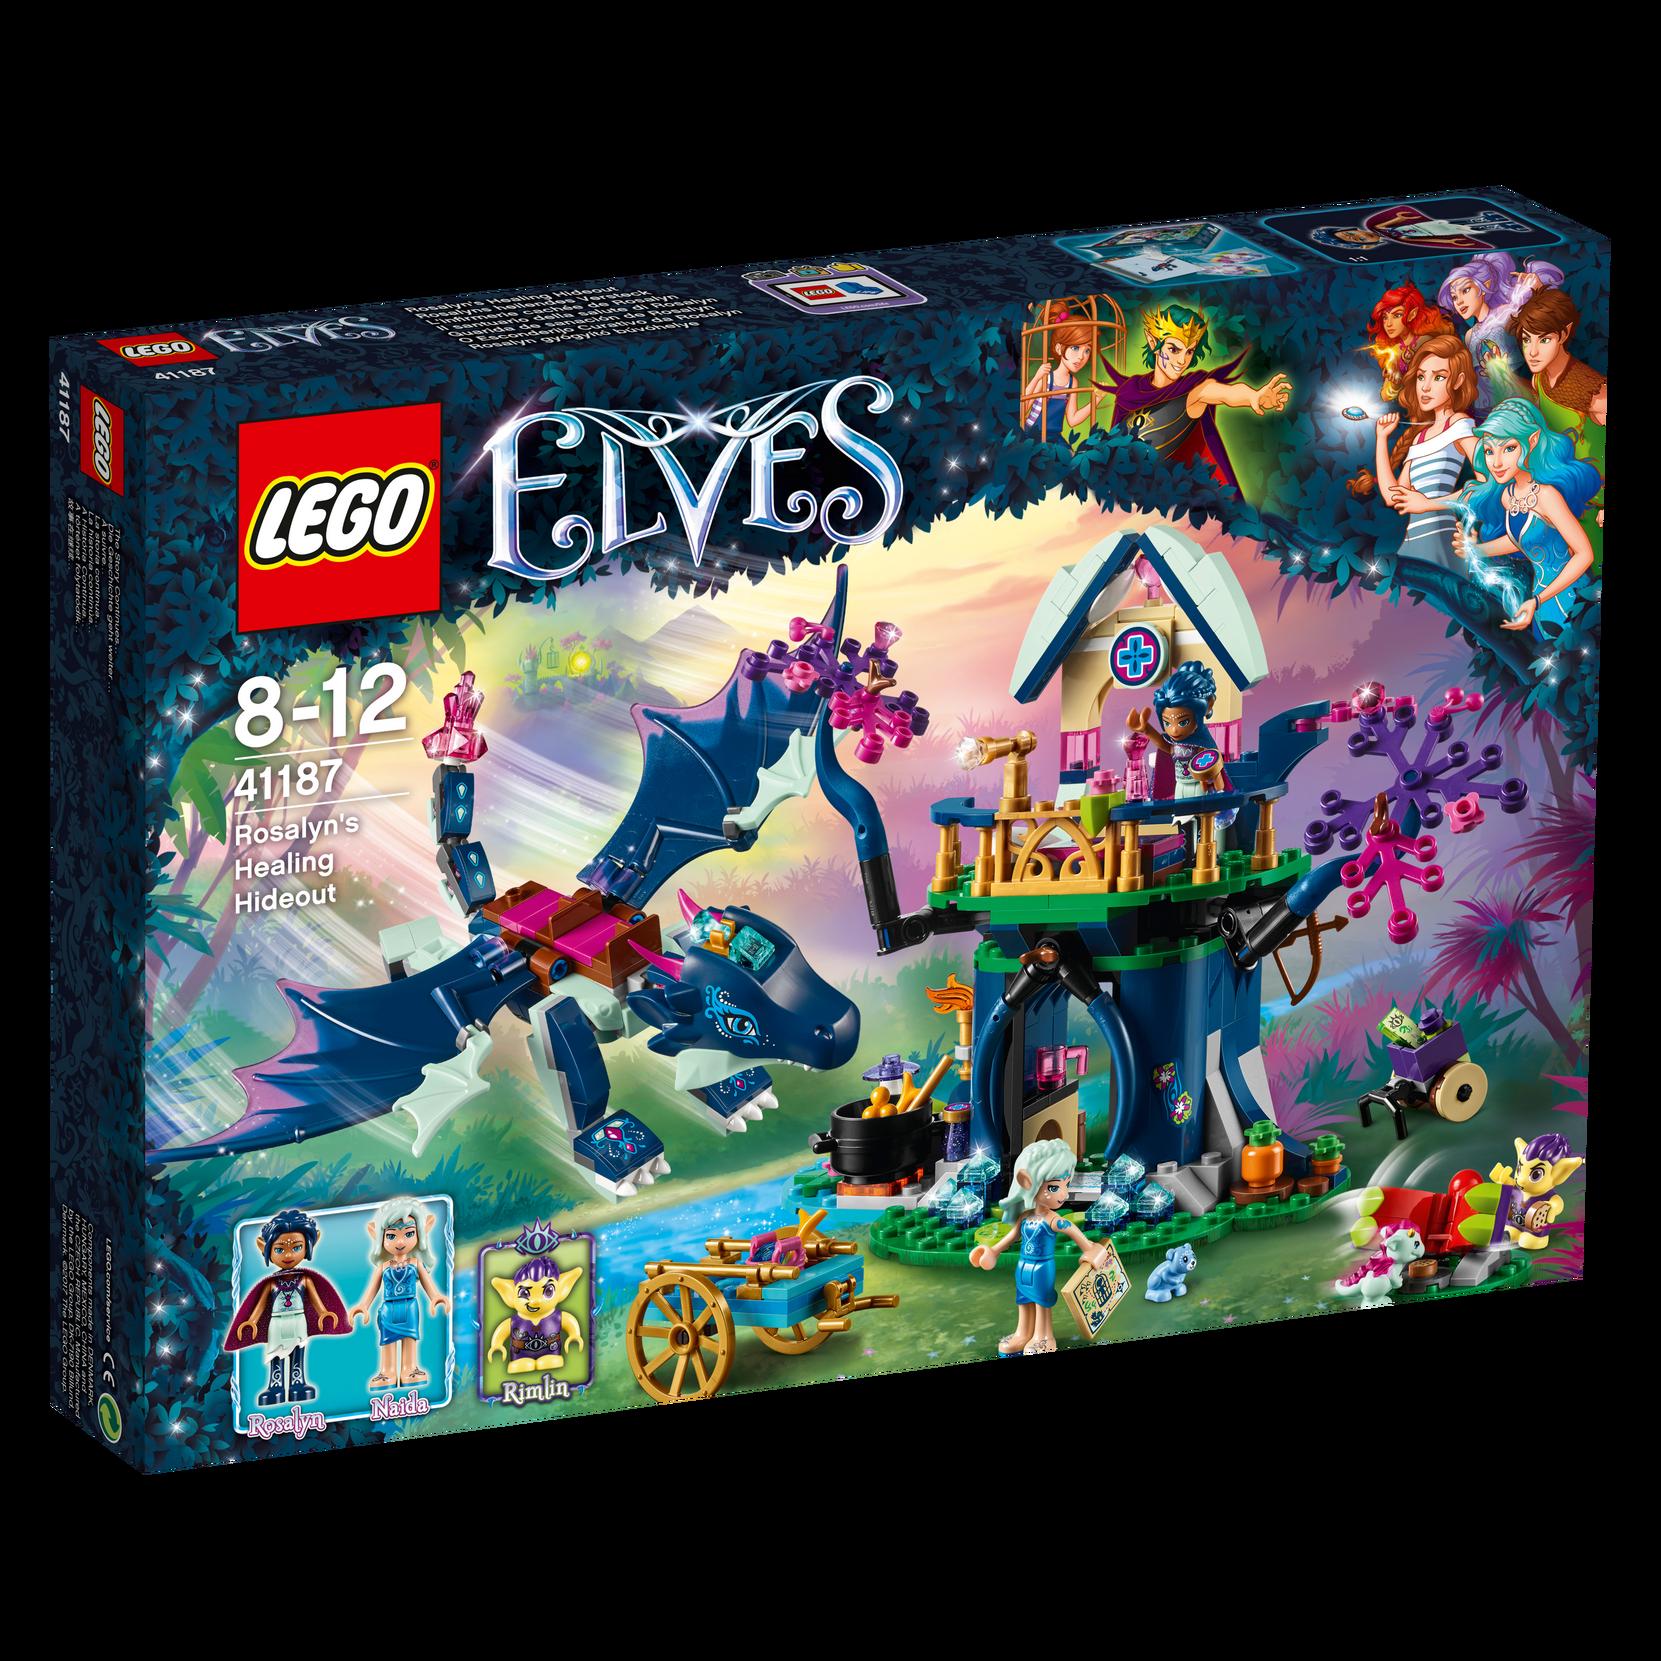 LEGO Elves Rosalynin parantava piilopaikka 41187